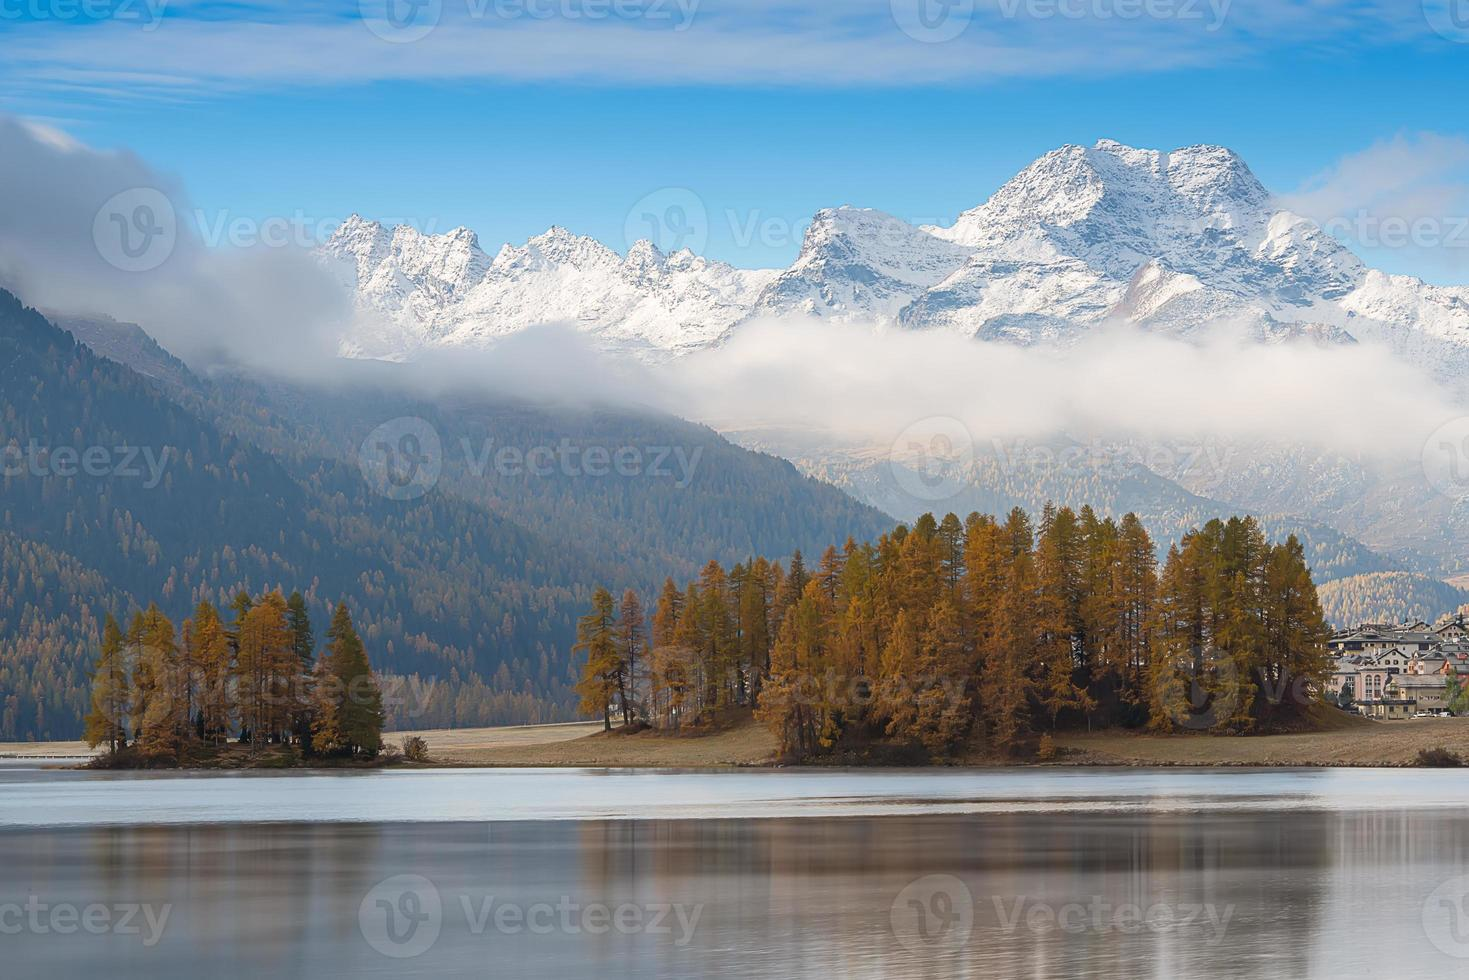 lago del valle de la engadina cerca de sankt moritz foto